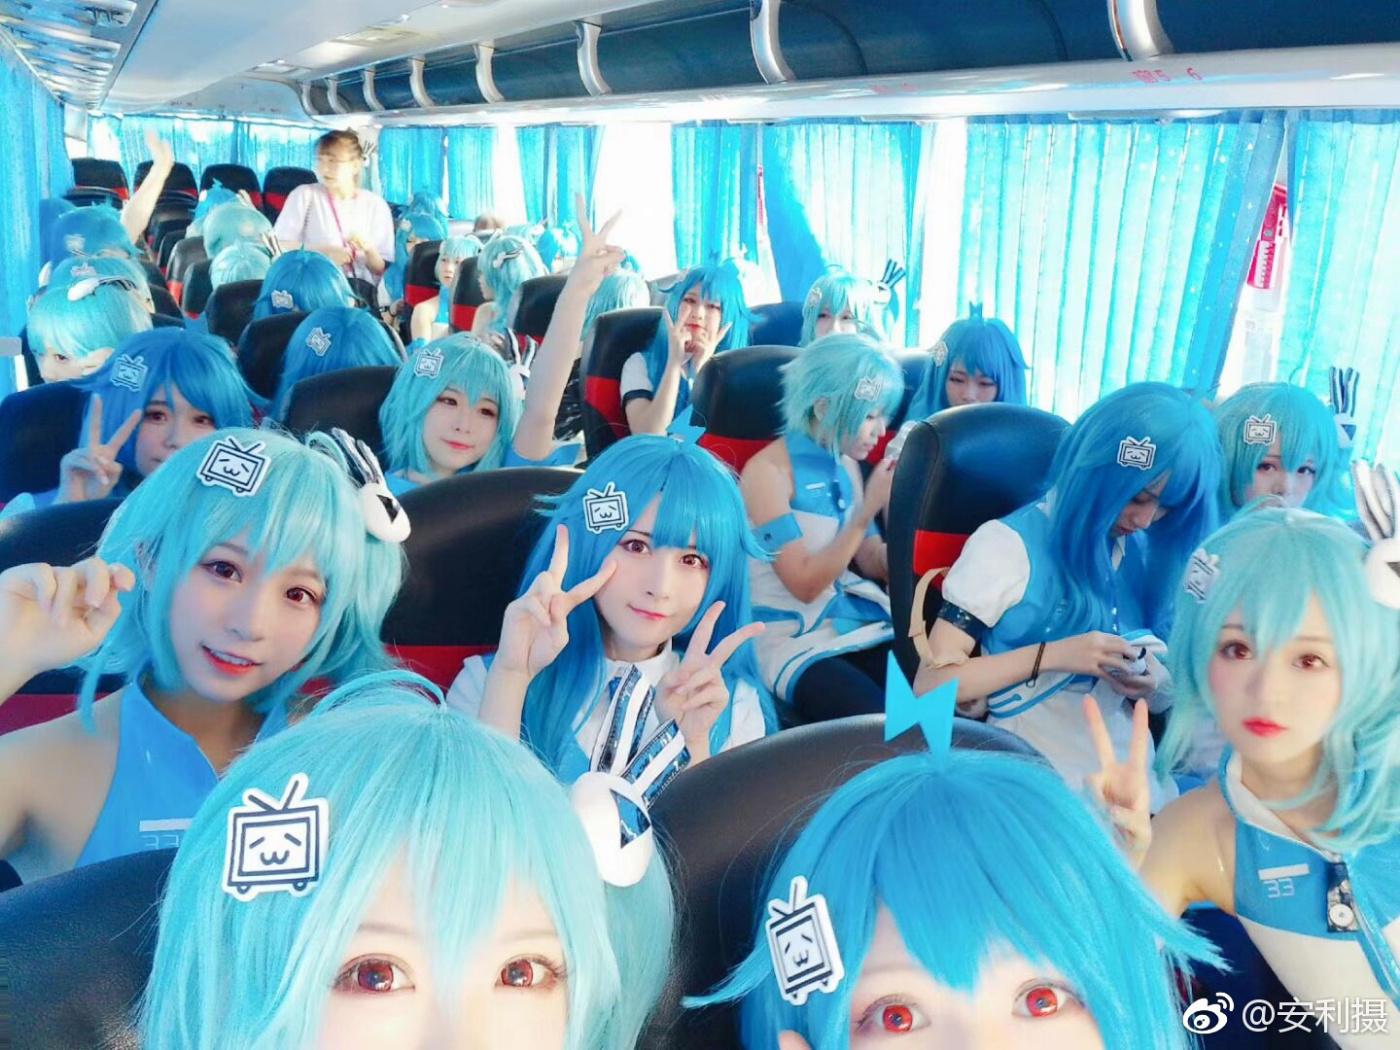 qvdo2233b_bml现场出现的2233娘,会成为中国年轻文化的代表吗?